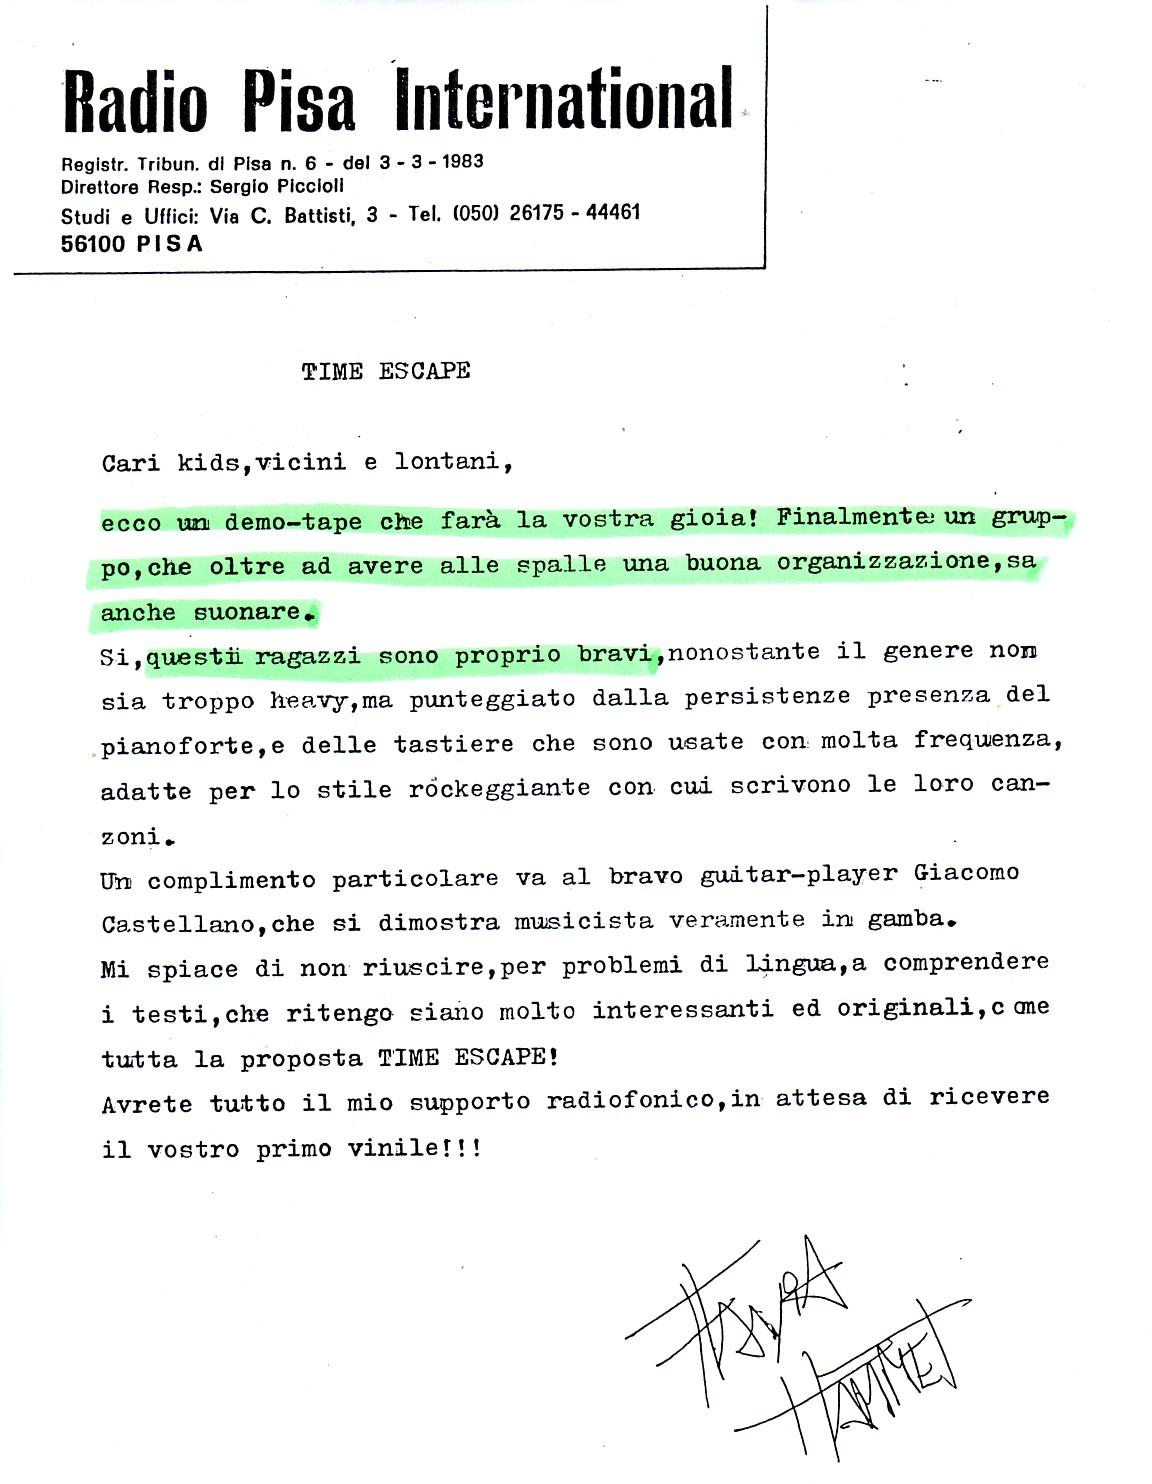 RADIO PISA INTERNATIONAL (ITALY) - 1988